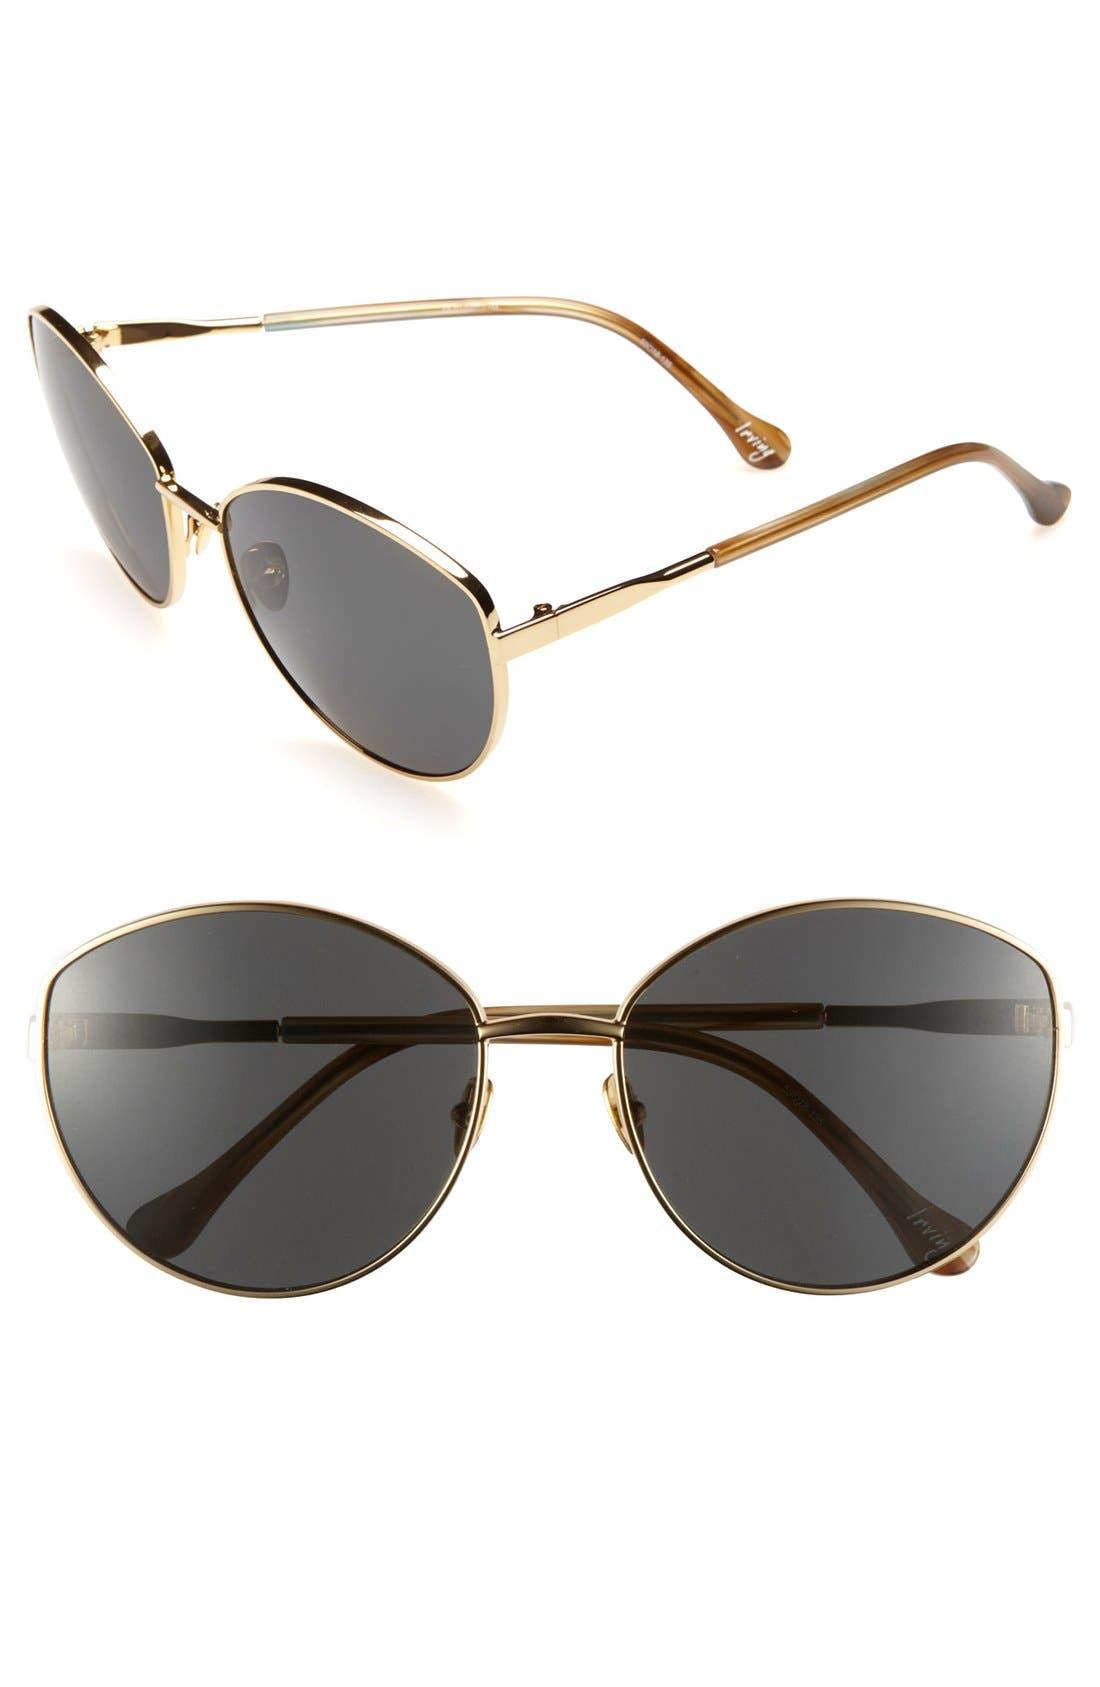 Alternate Image 1 Selected - Elizabeth and James 'Irving' 59mm Sunglasses